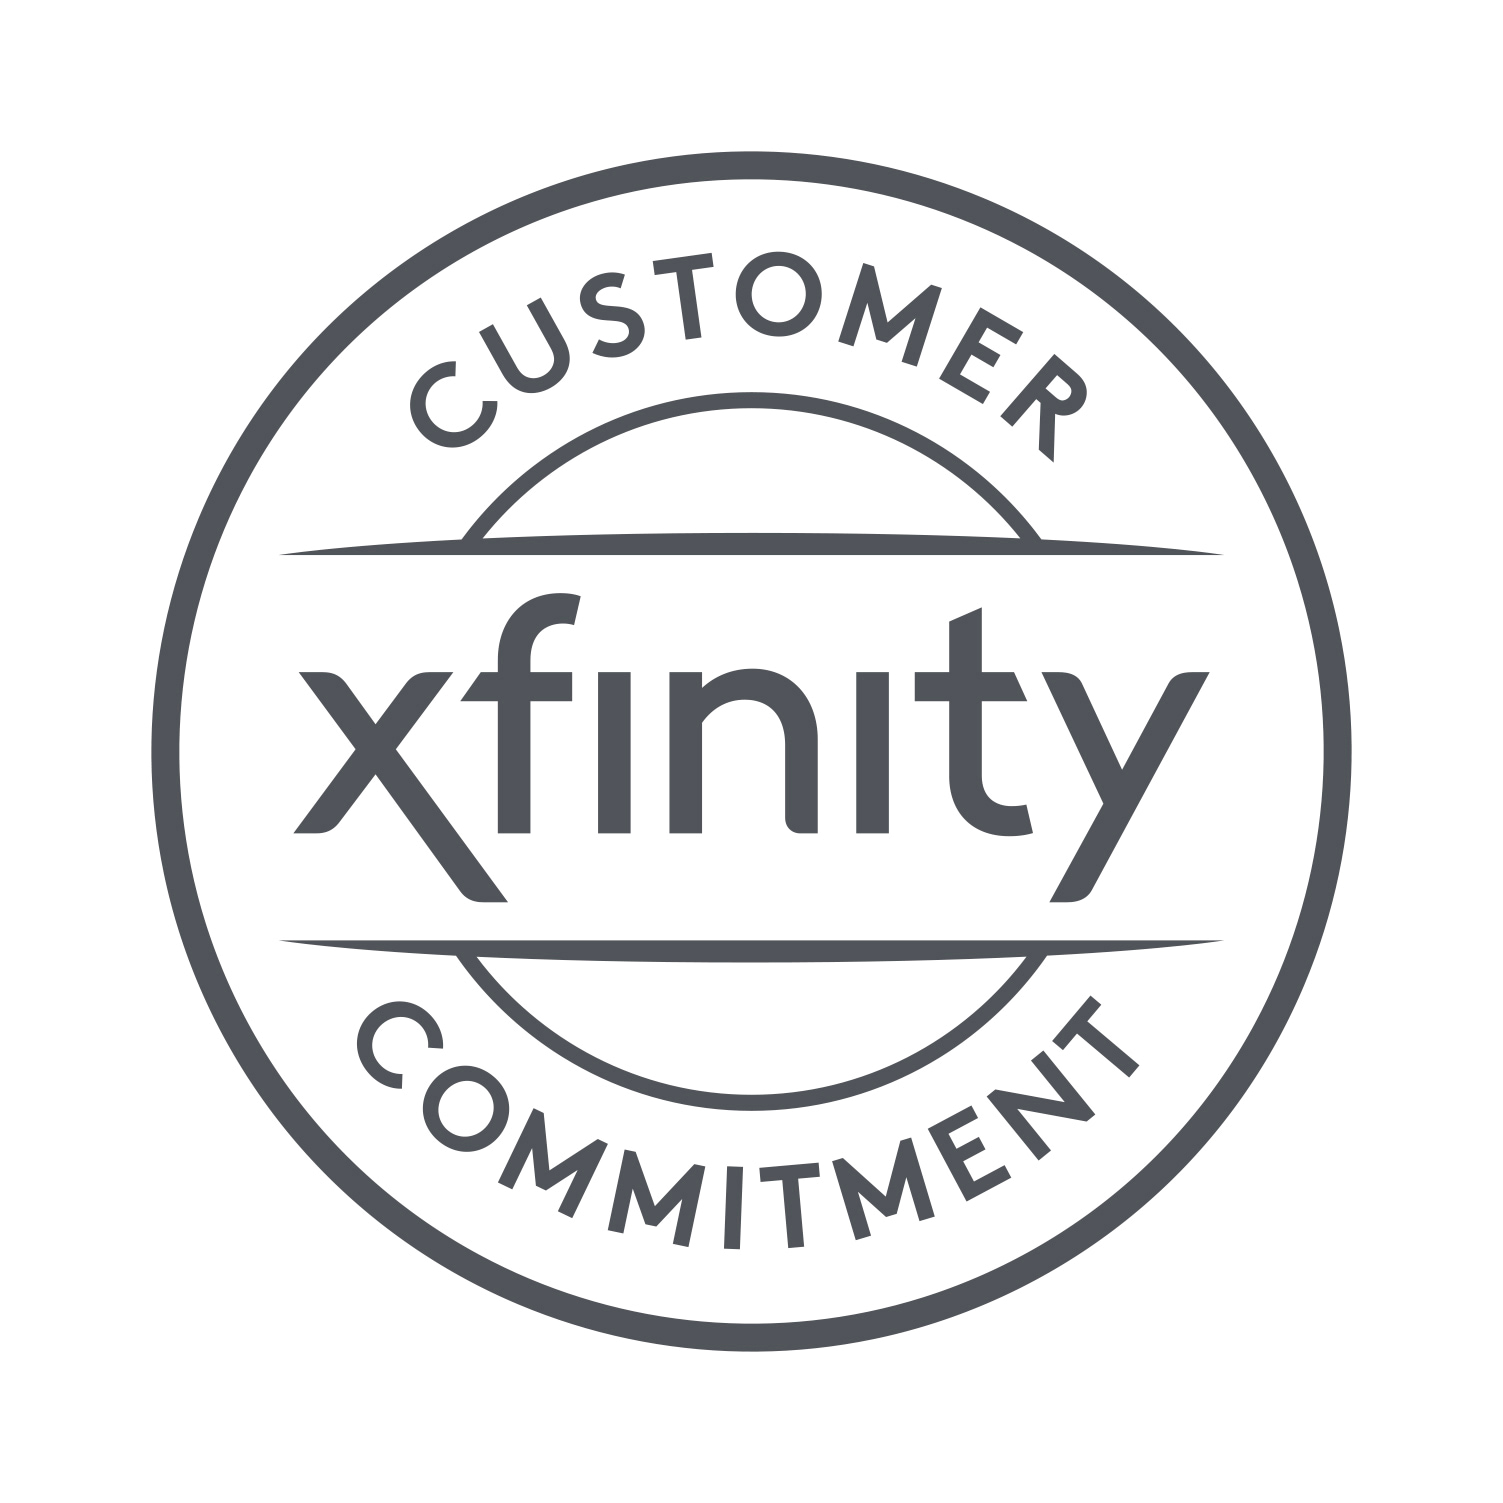 Xfinity Customer Commitment